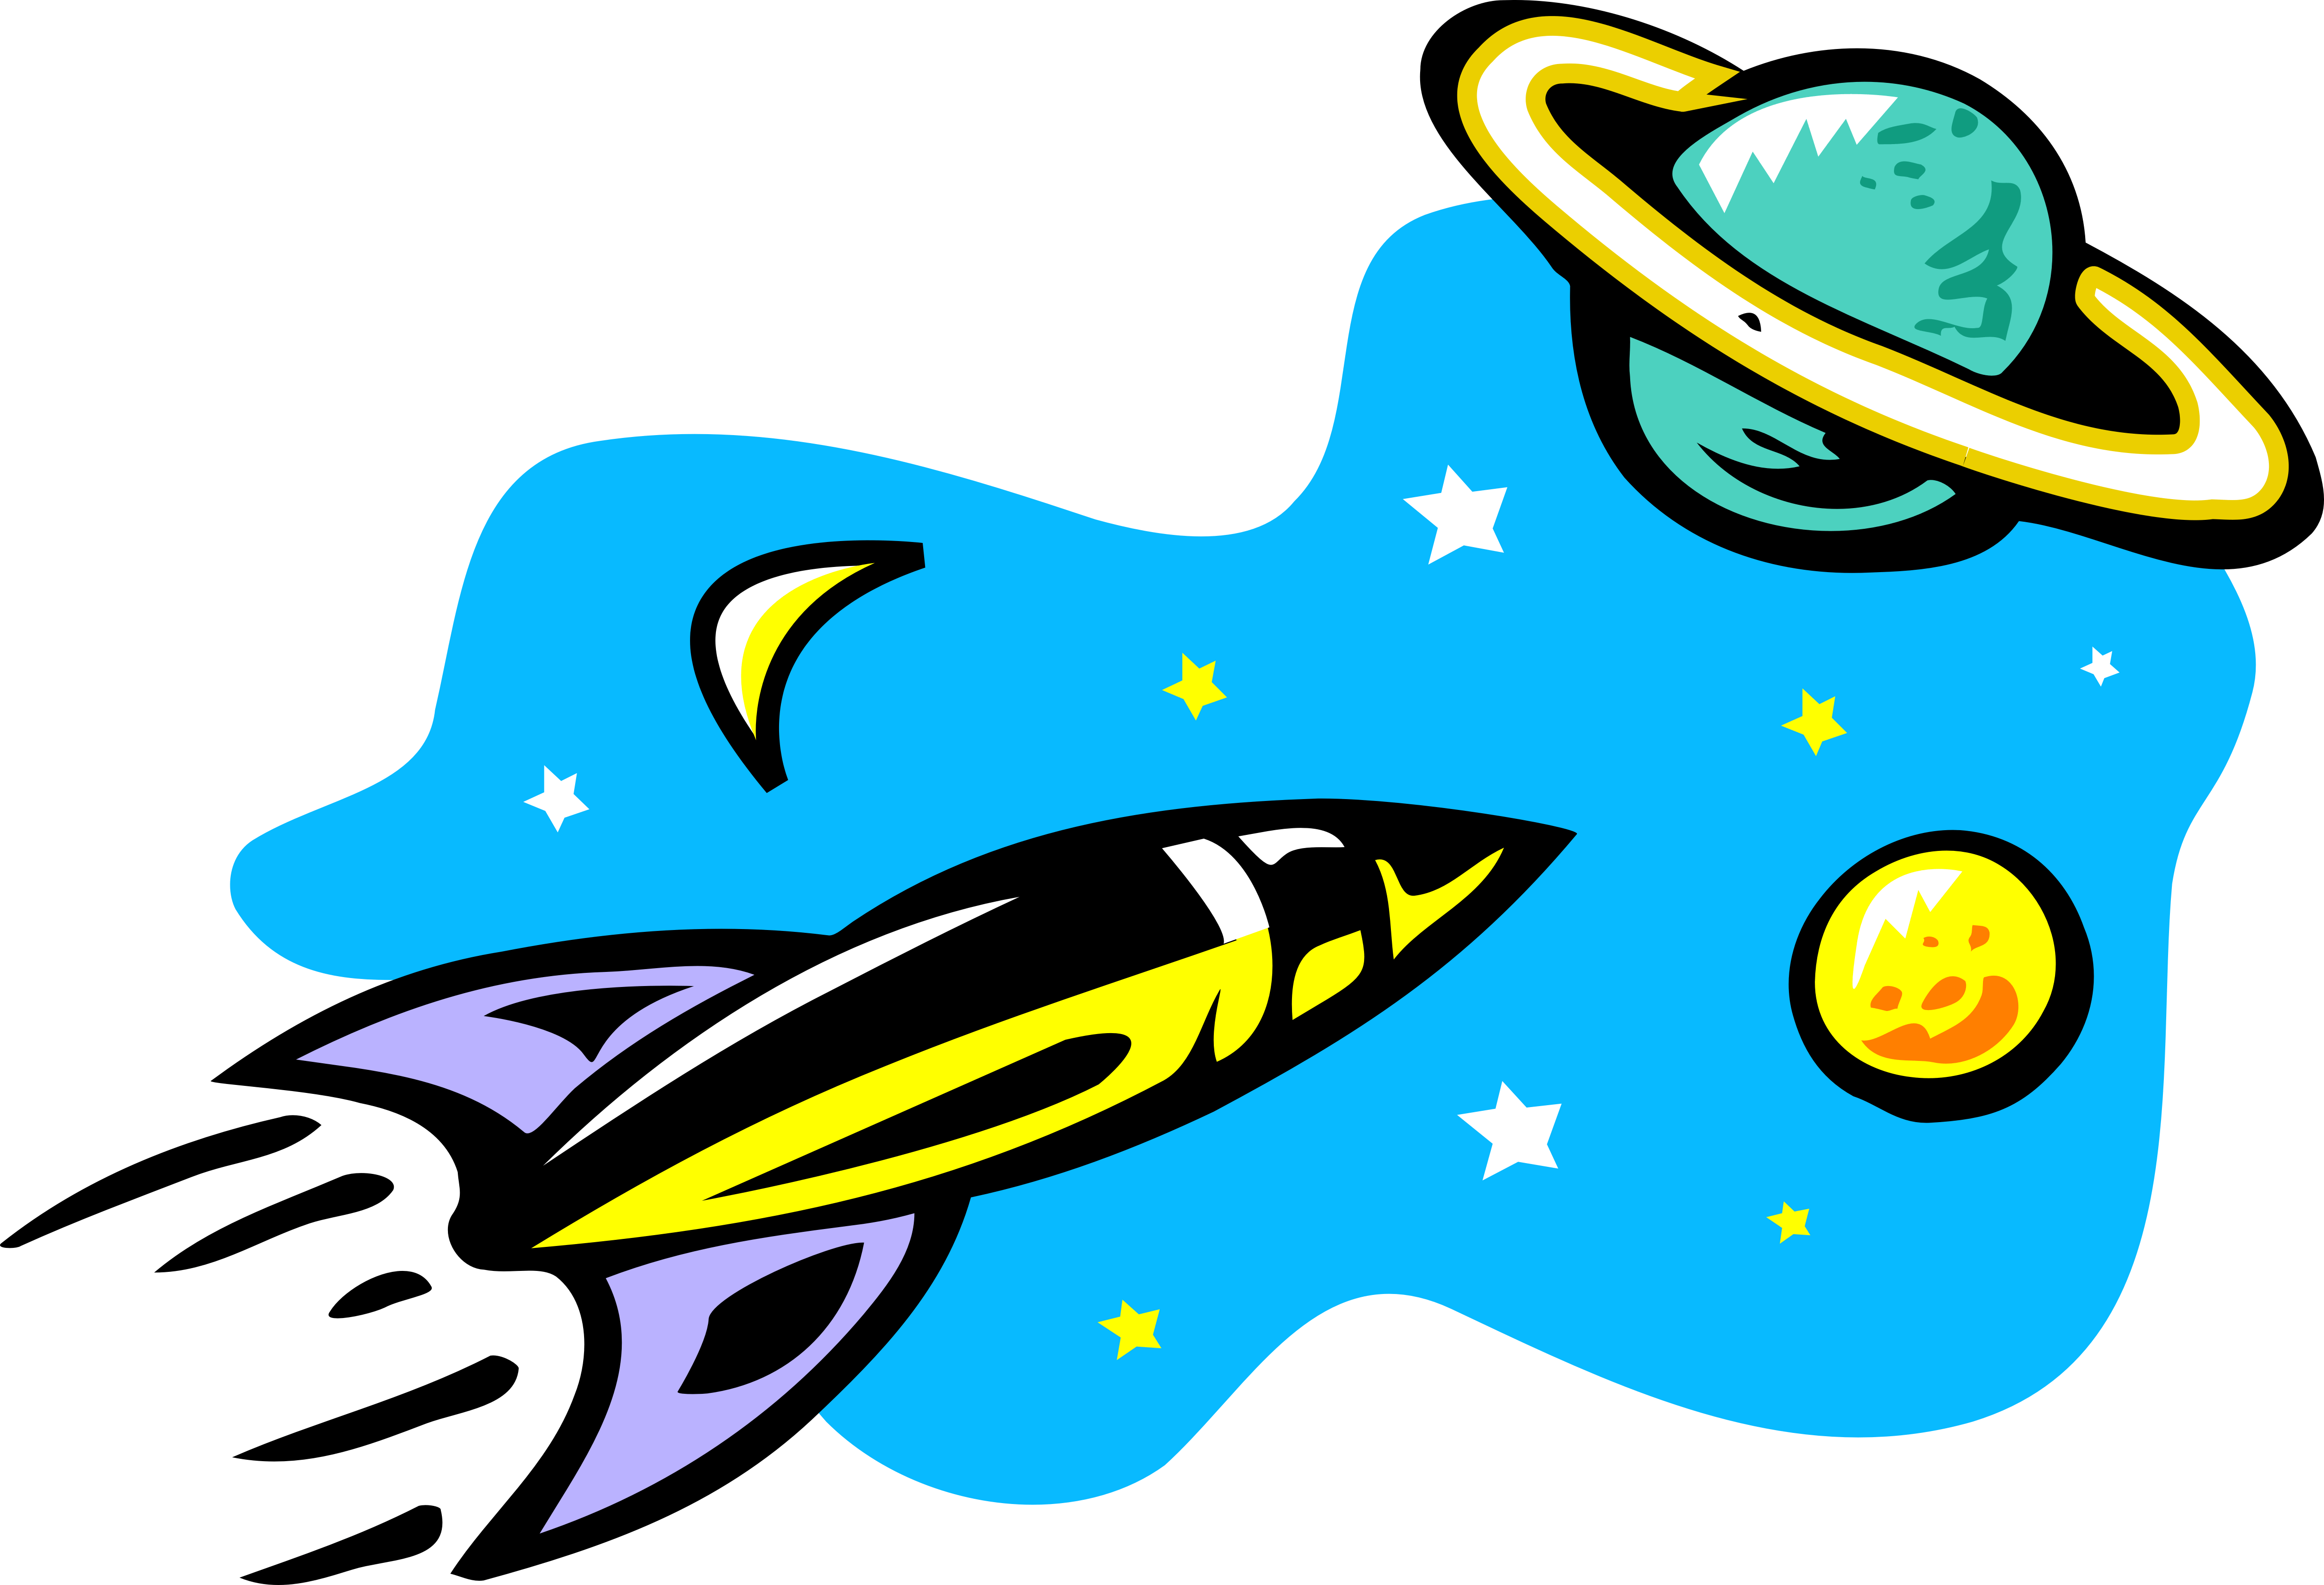 Рисунки о космосе 22 фотография